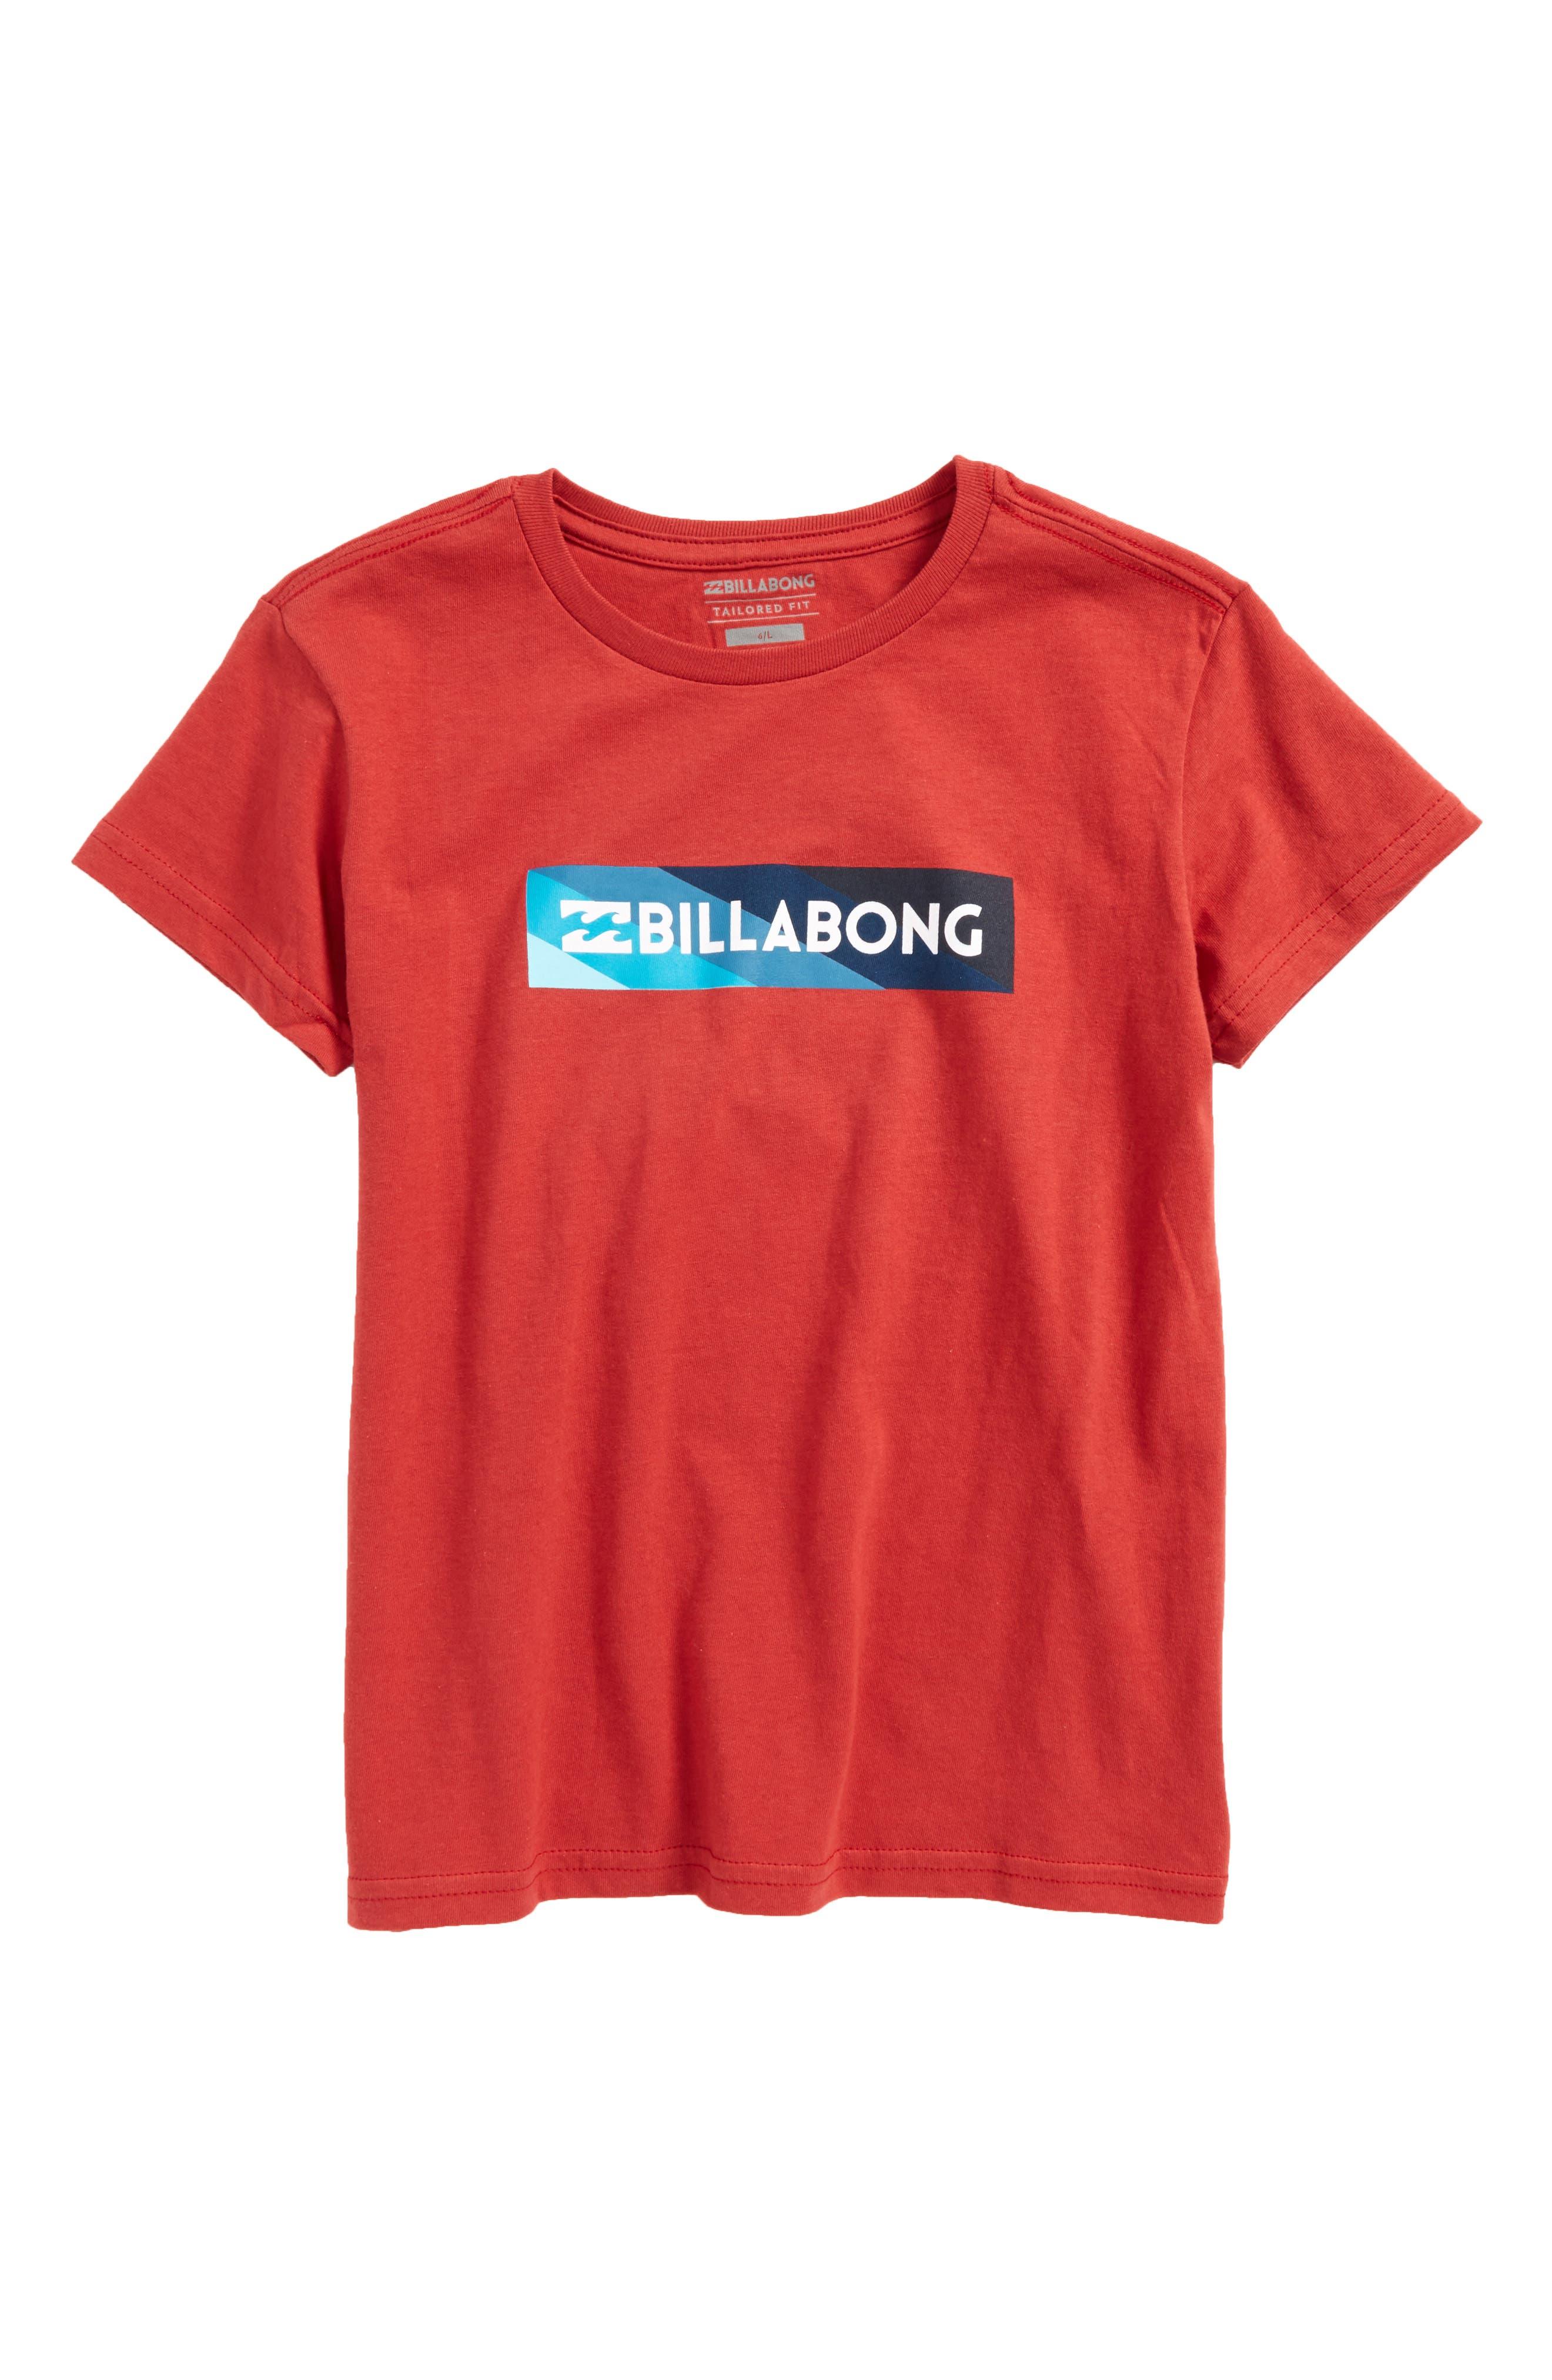 Main Image - Billabong Unity Block Graphic T-Shirt (Toddler Boys & Little Boys)